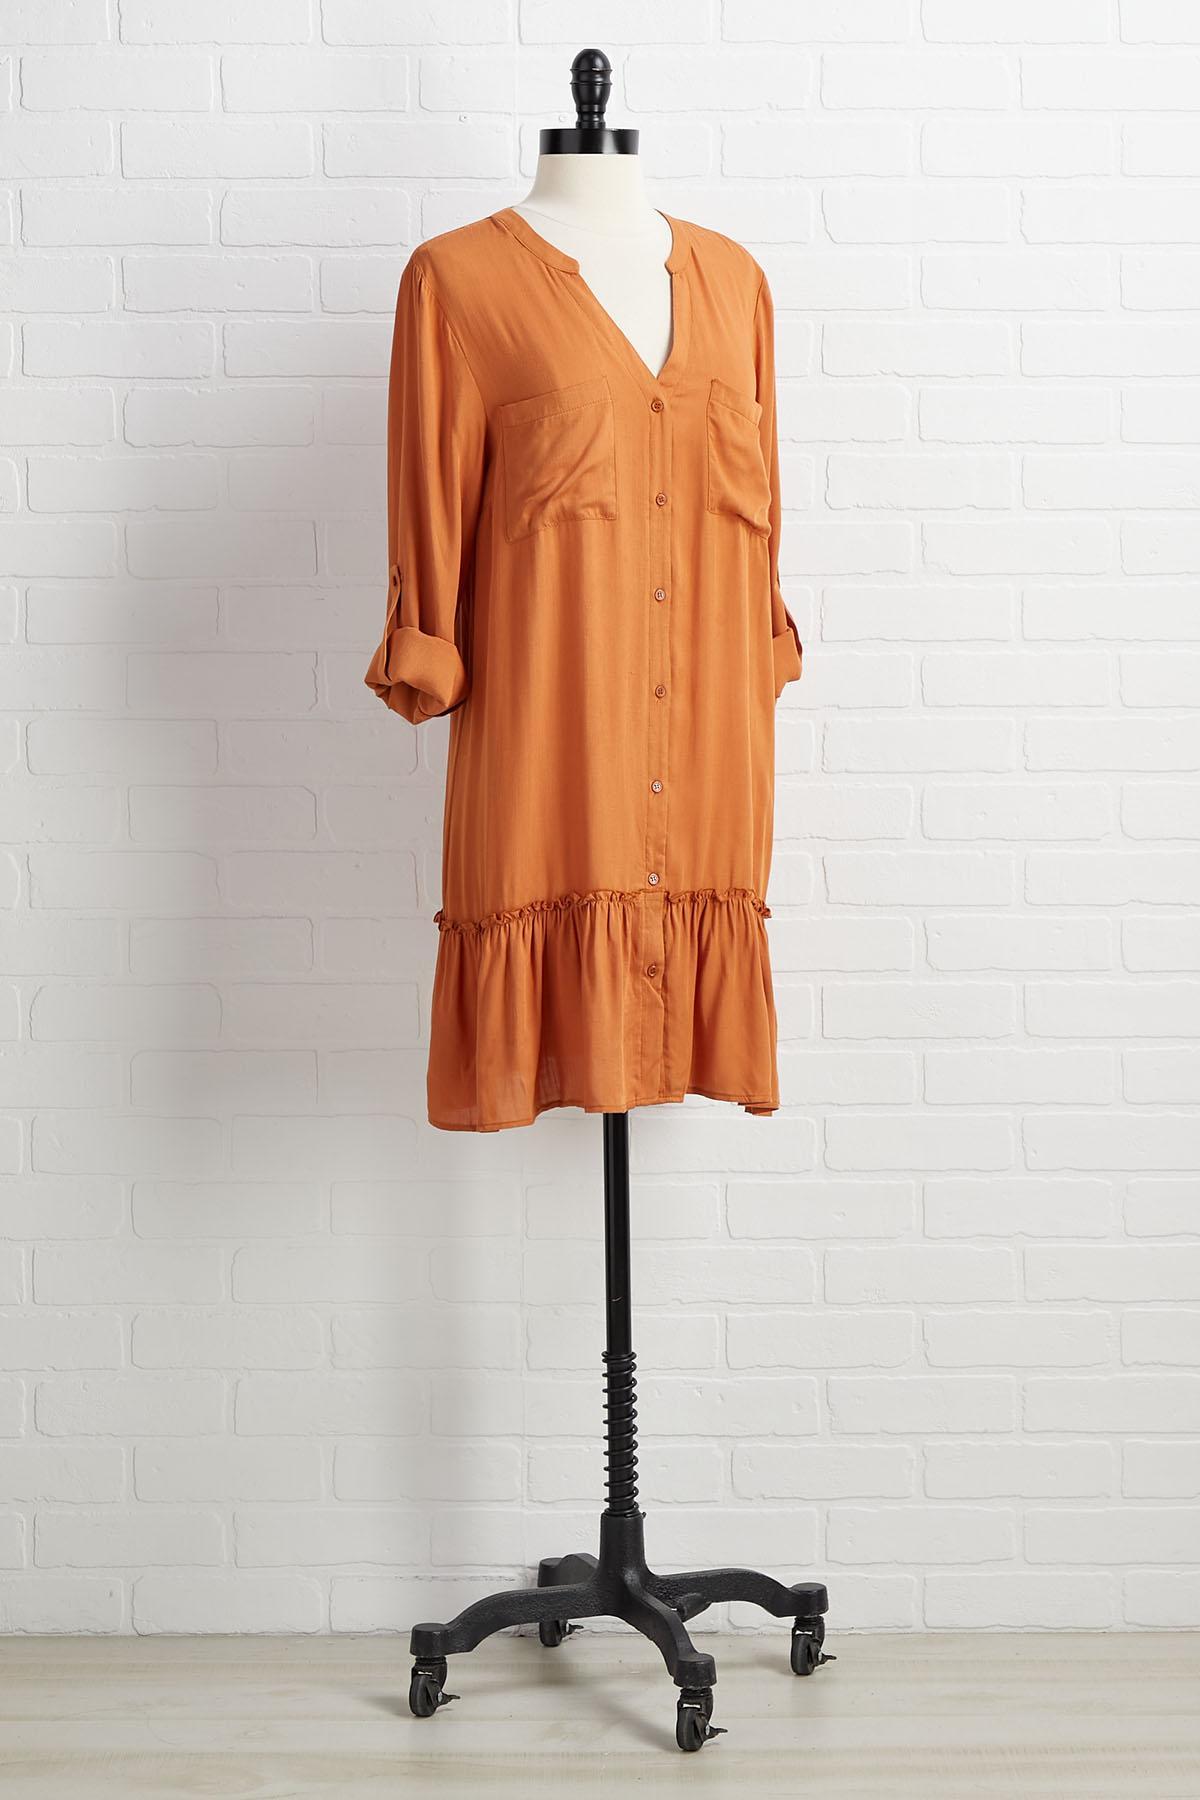 Partly Sunny Skies Dress